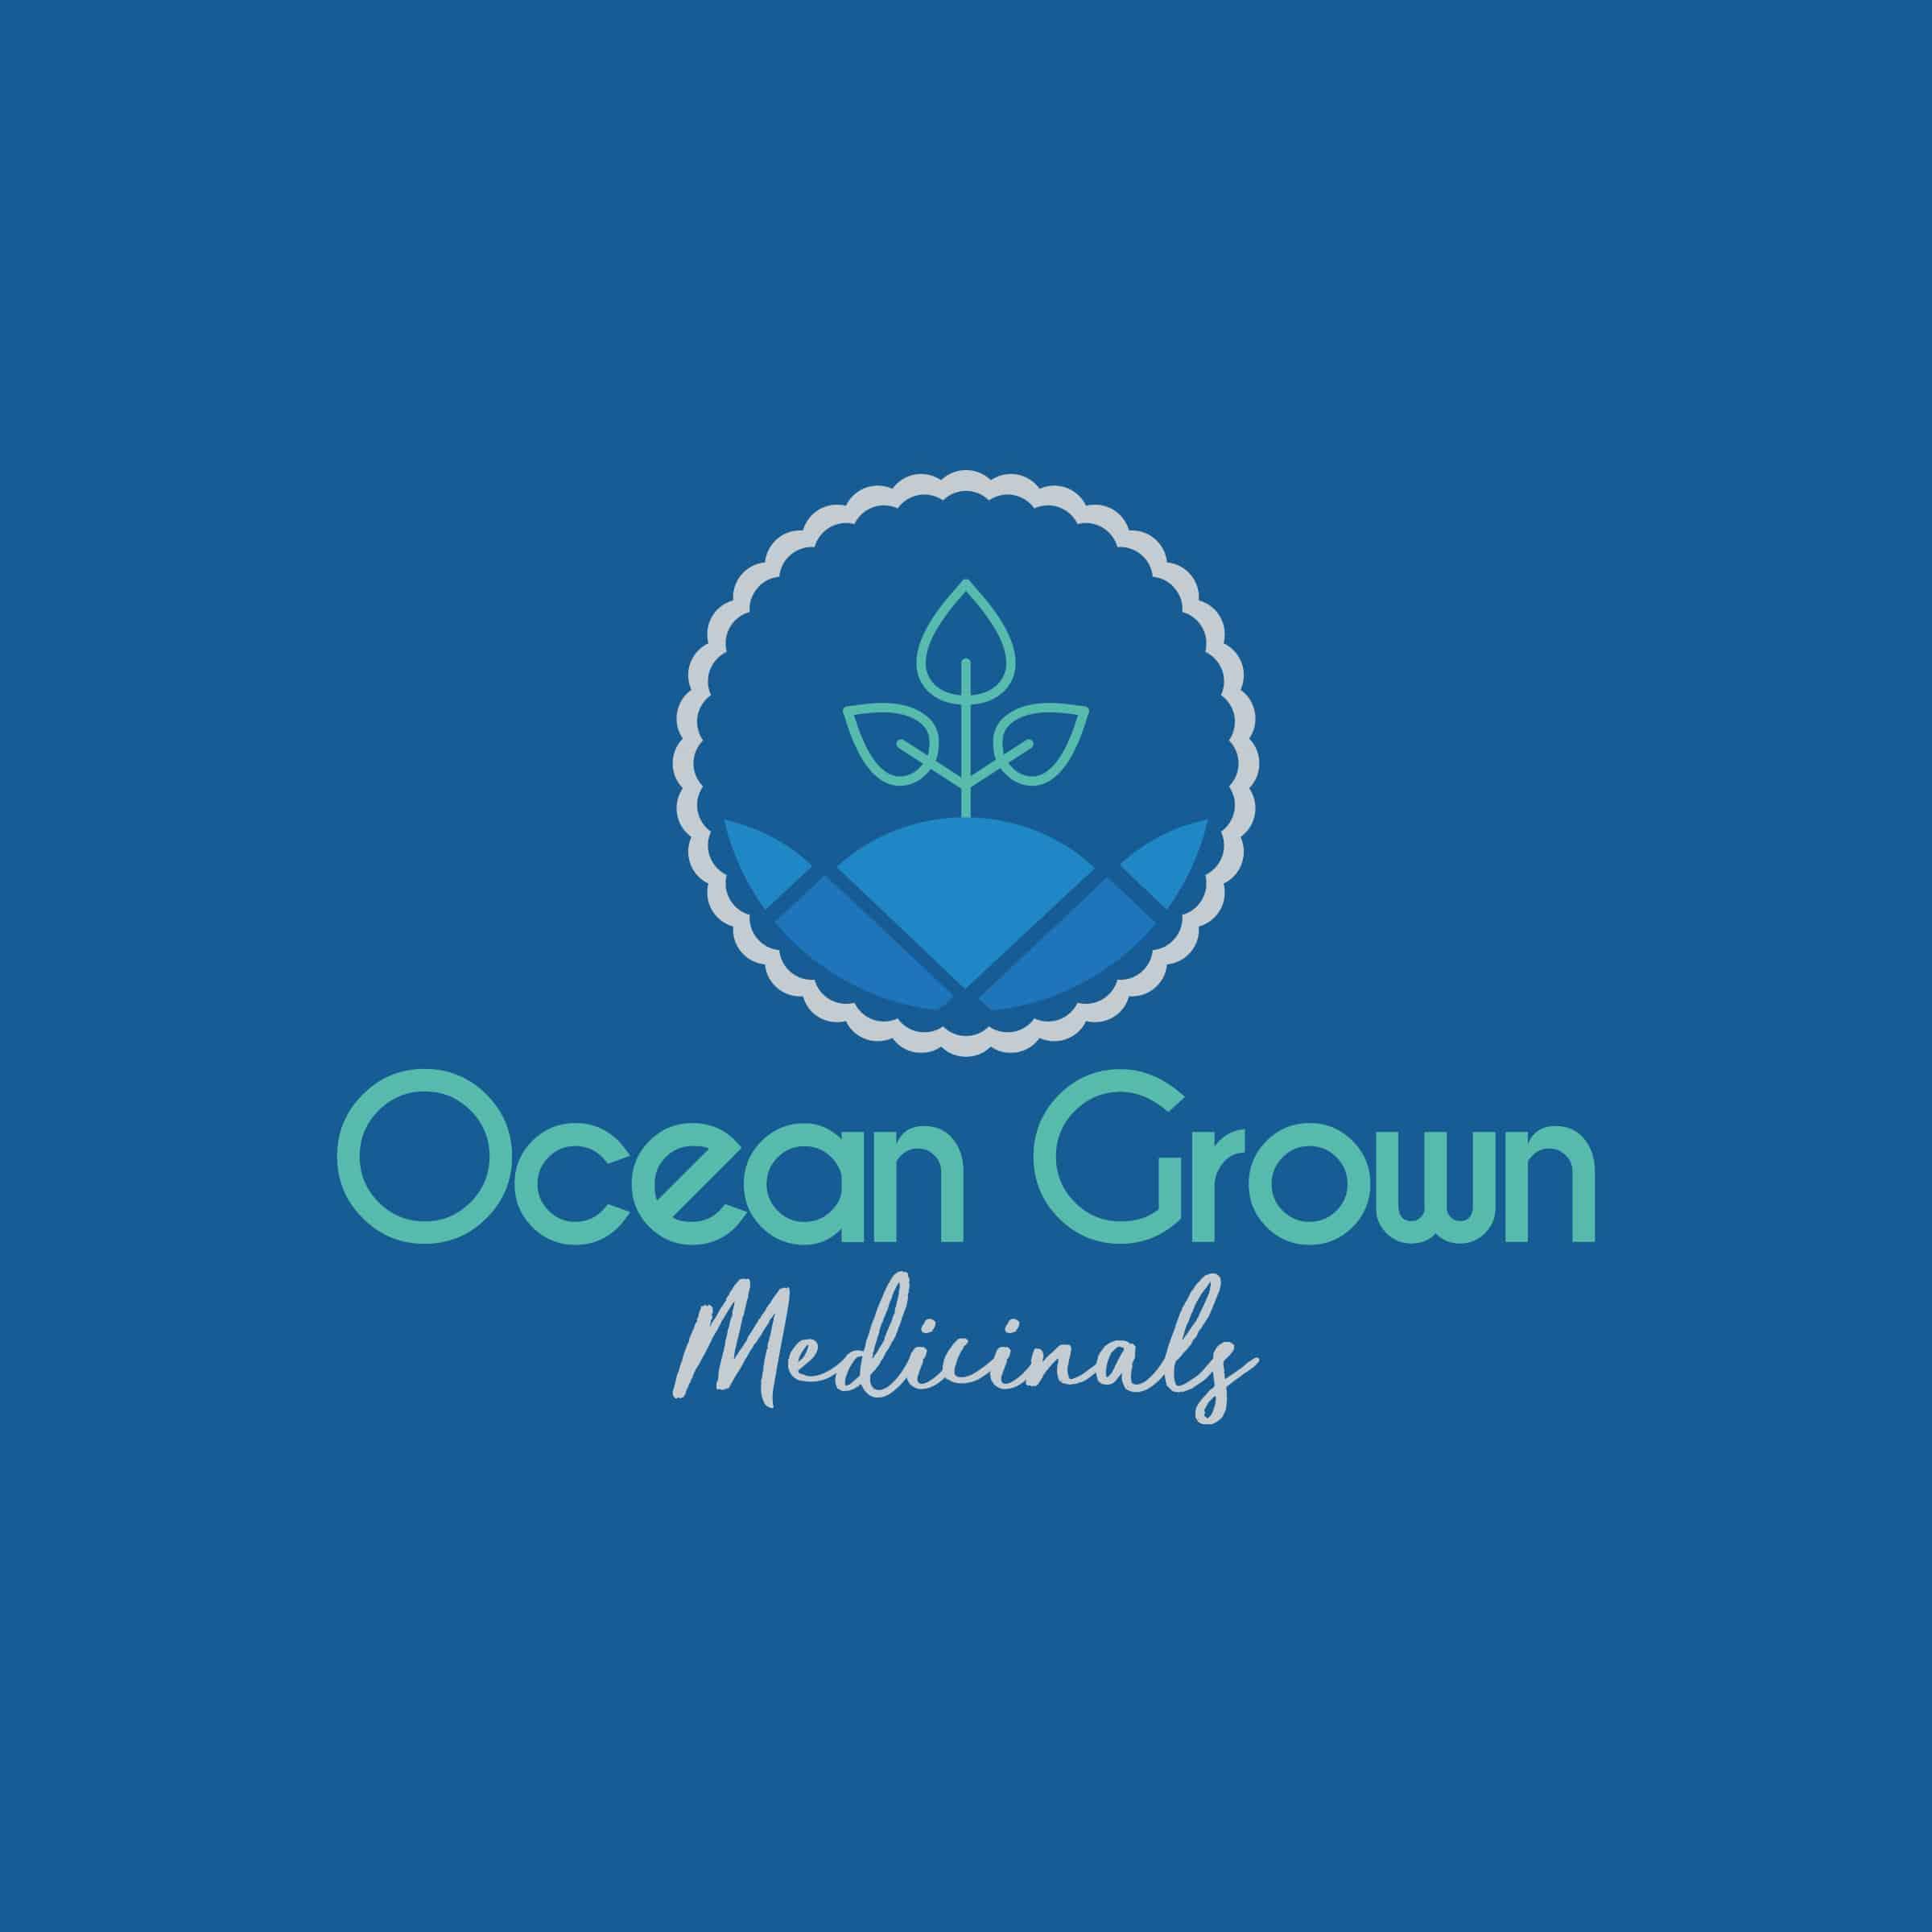 Logo design and branding for Ocean Grown Medicinals